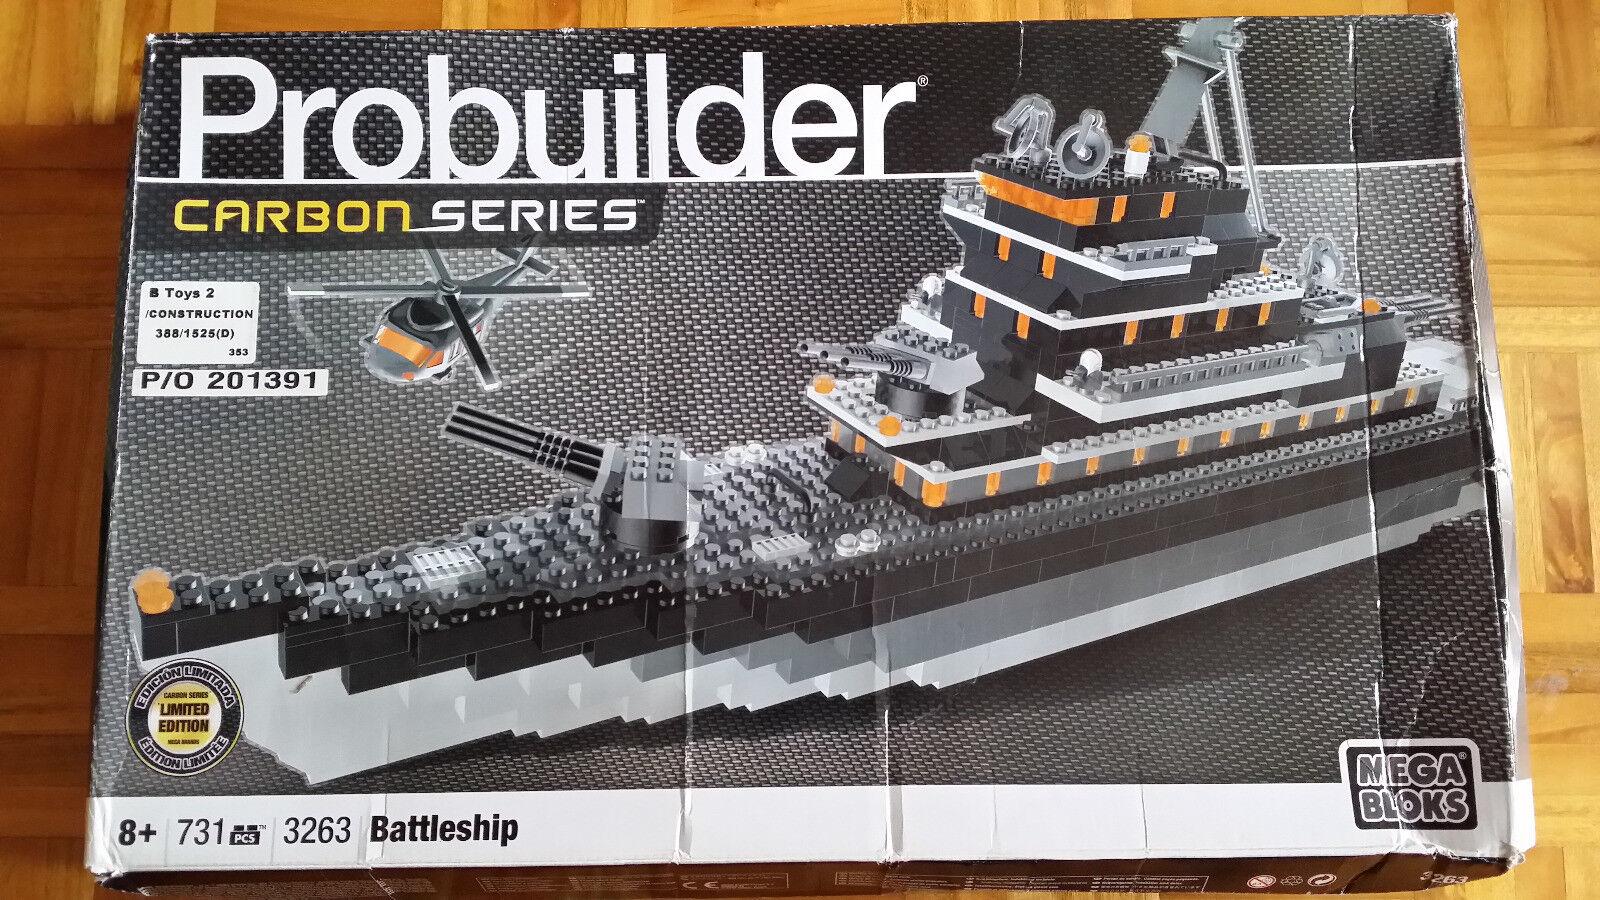 Mega Bloks Probuilder Battleship 3263 muy difícil de conseguir